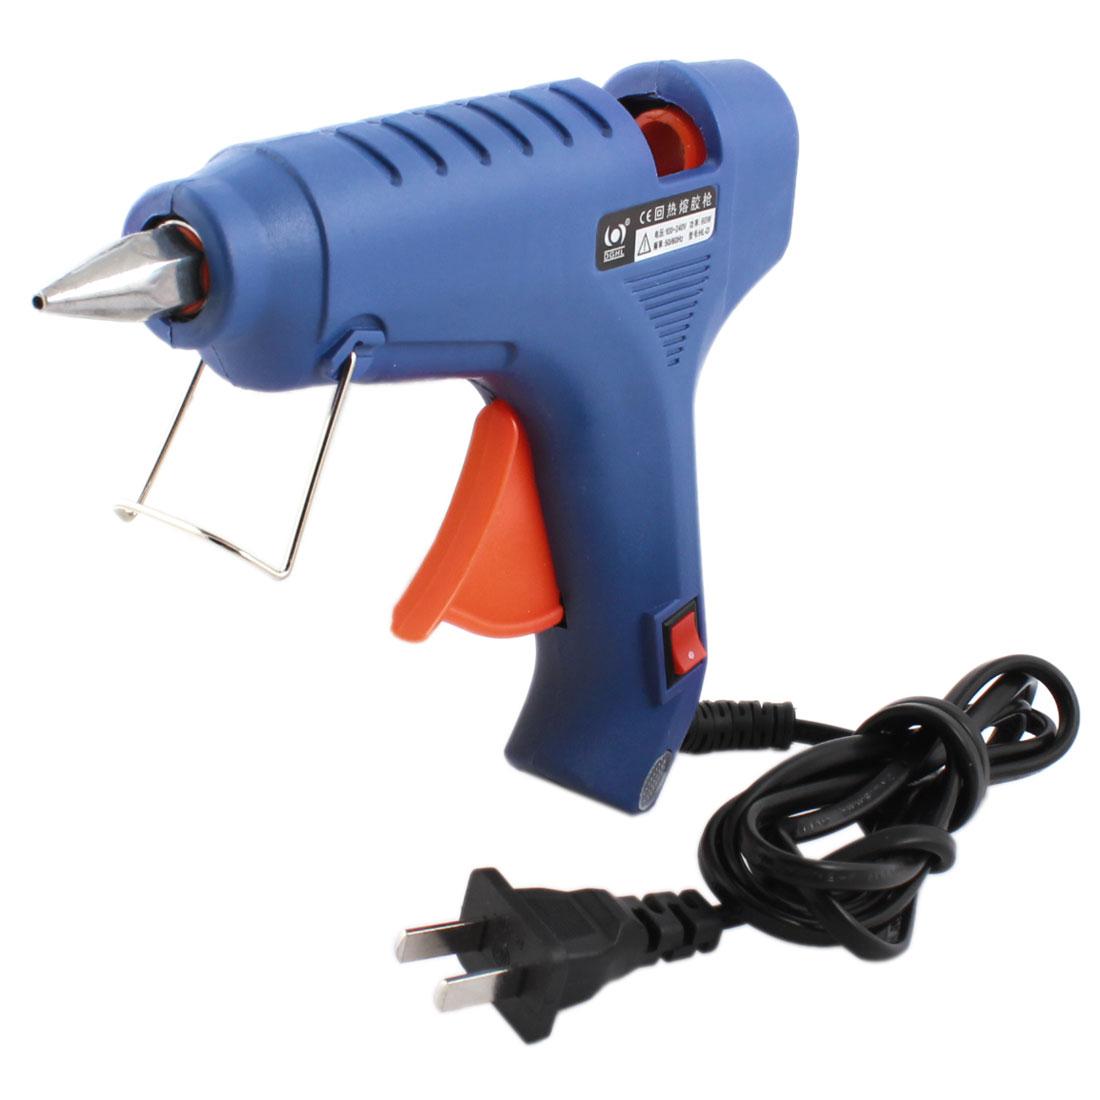 AC 100-240V US Plug 60W Triggered Electric Hot Melt Glue Gun HL-D